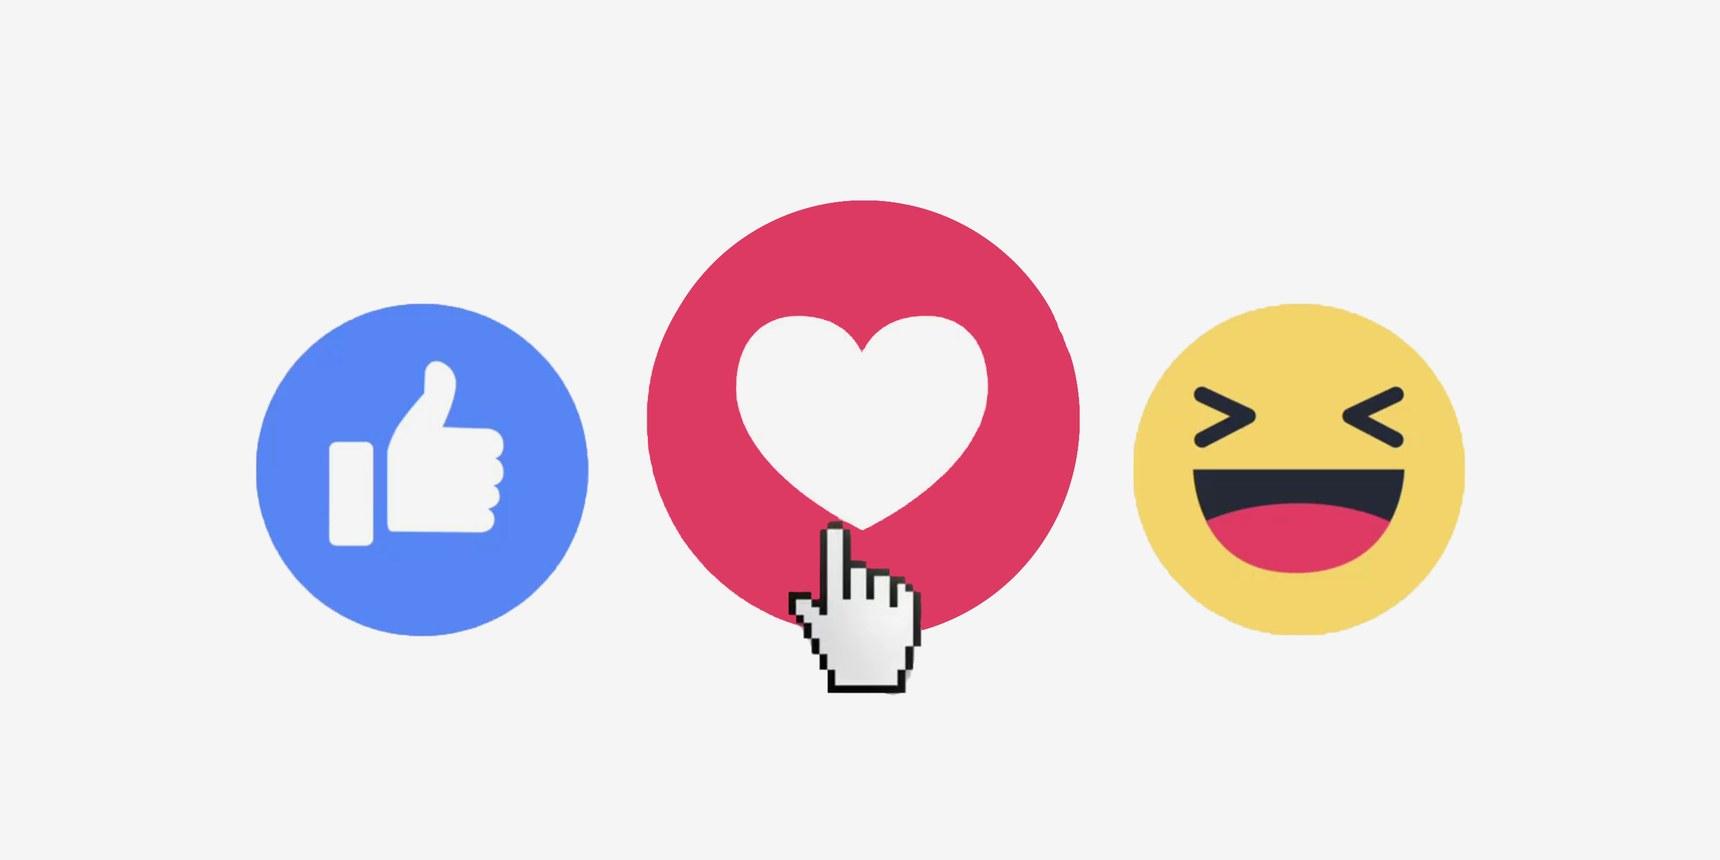 Facebook Brings Former Vine GM to Experimental Product Team